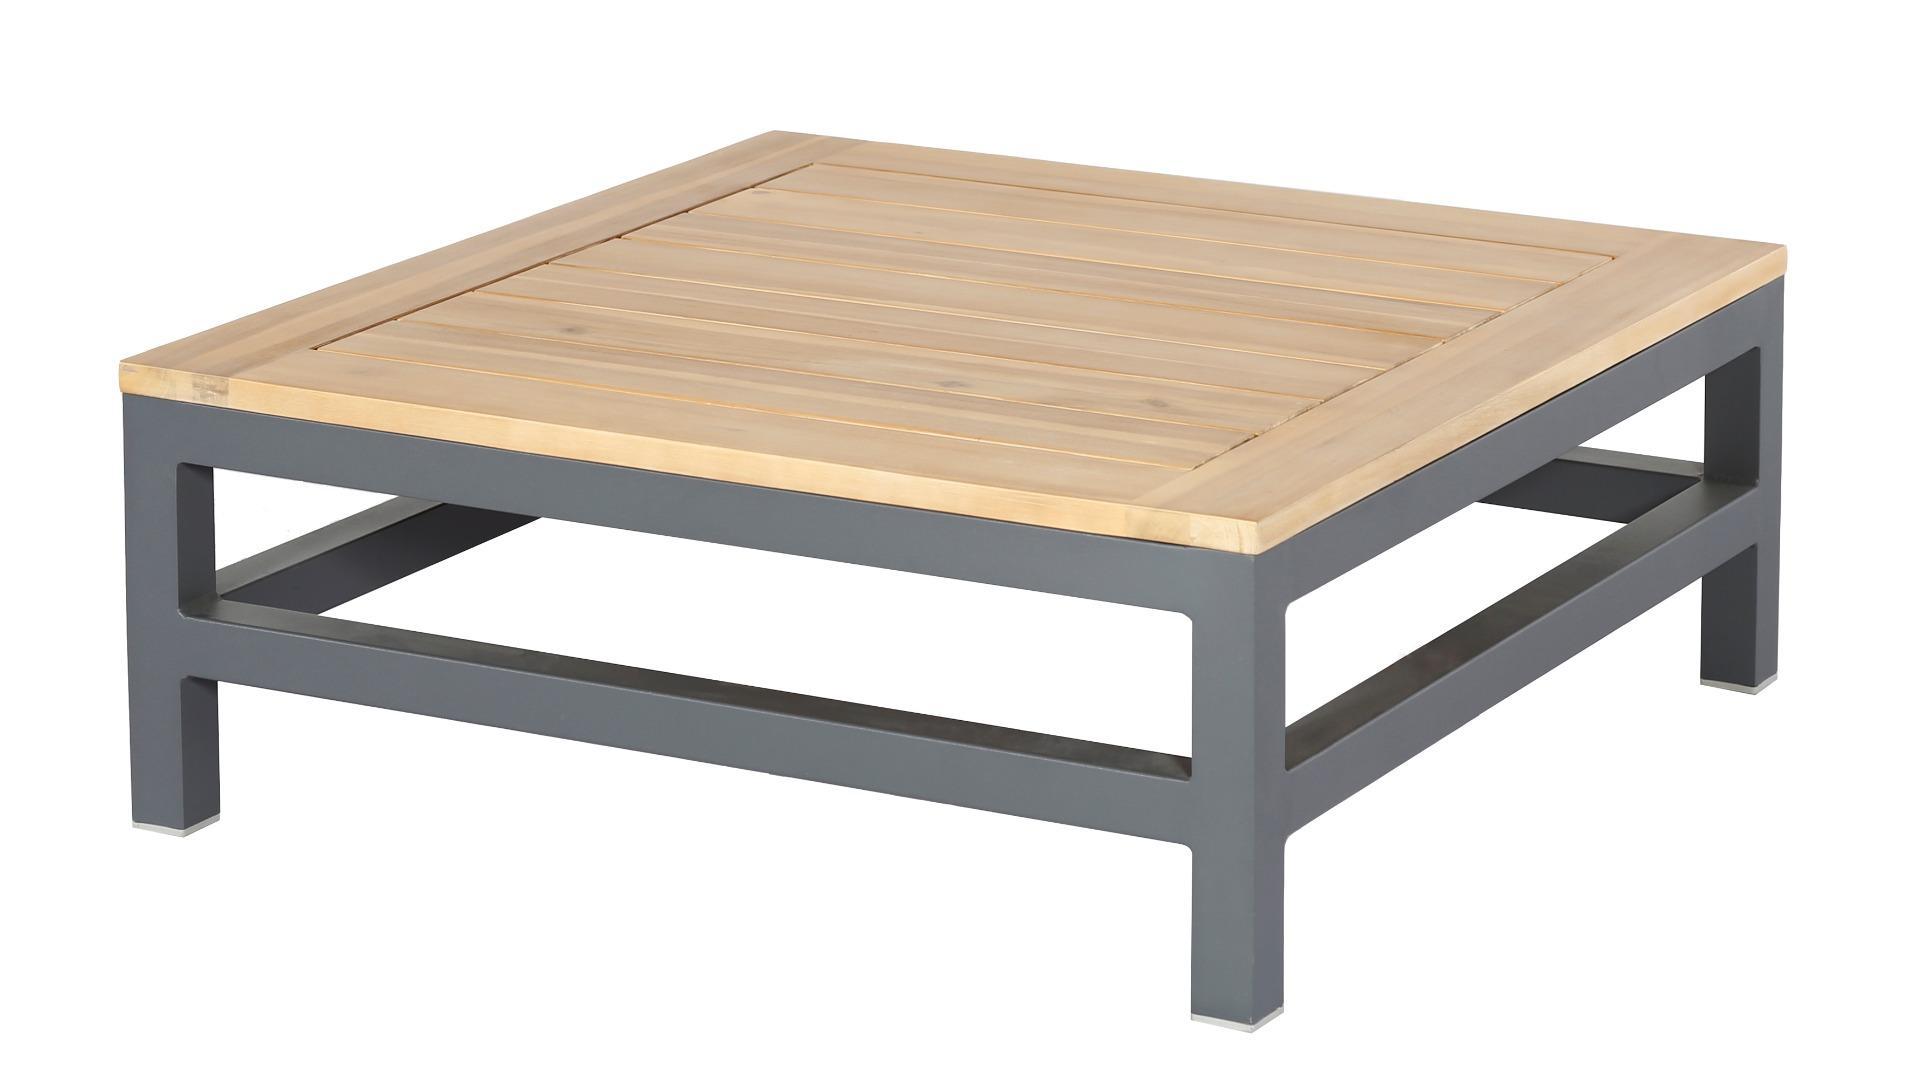 Betis lounge corner table 80x80x31cm